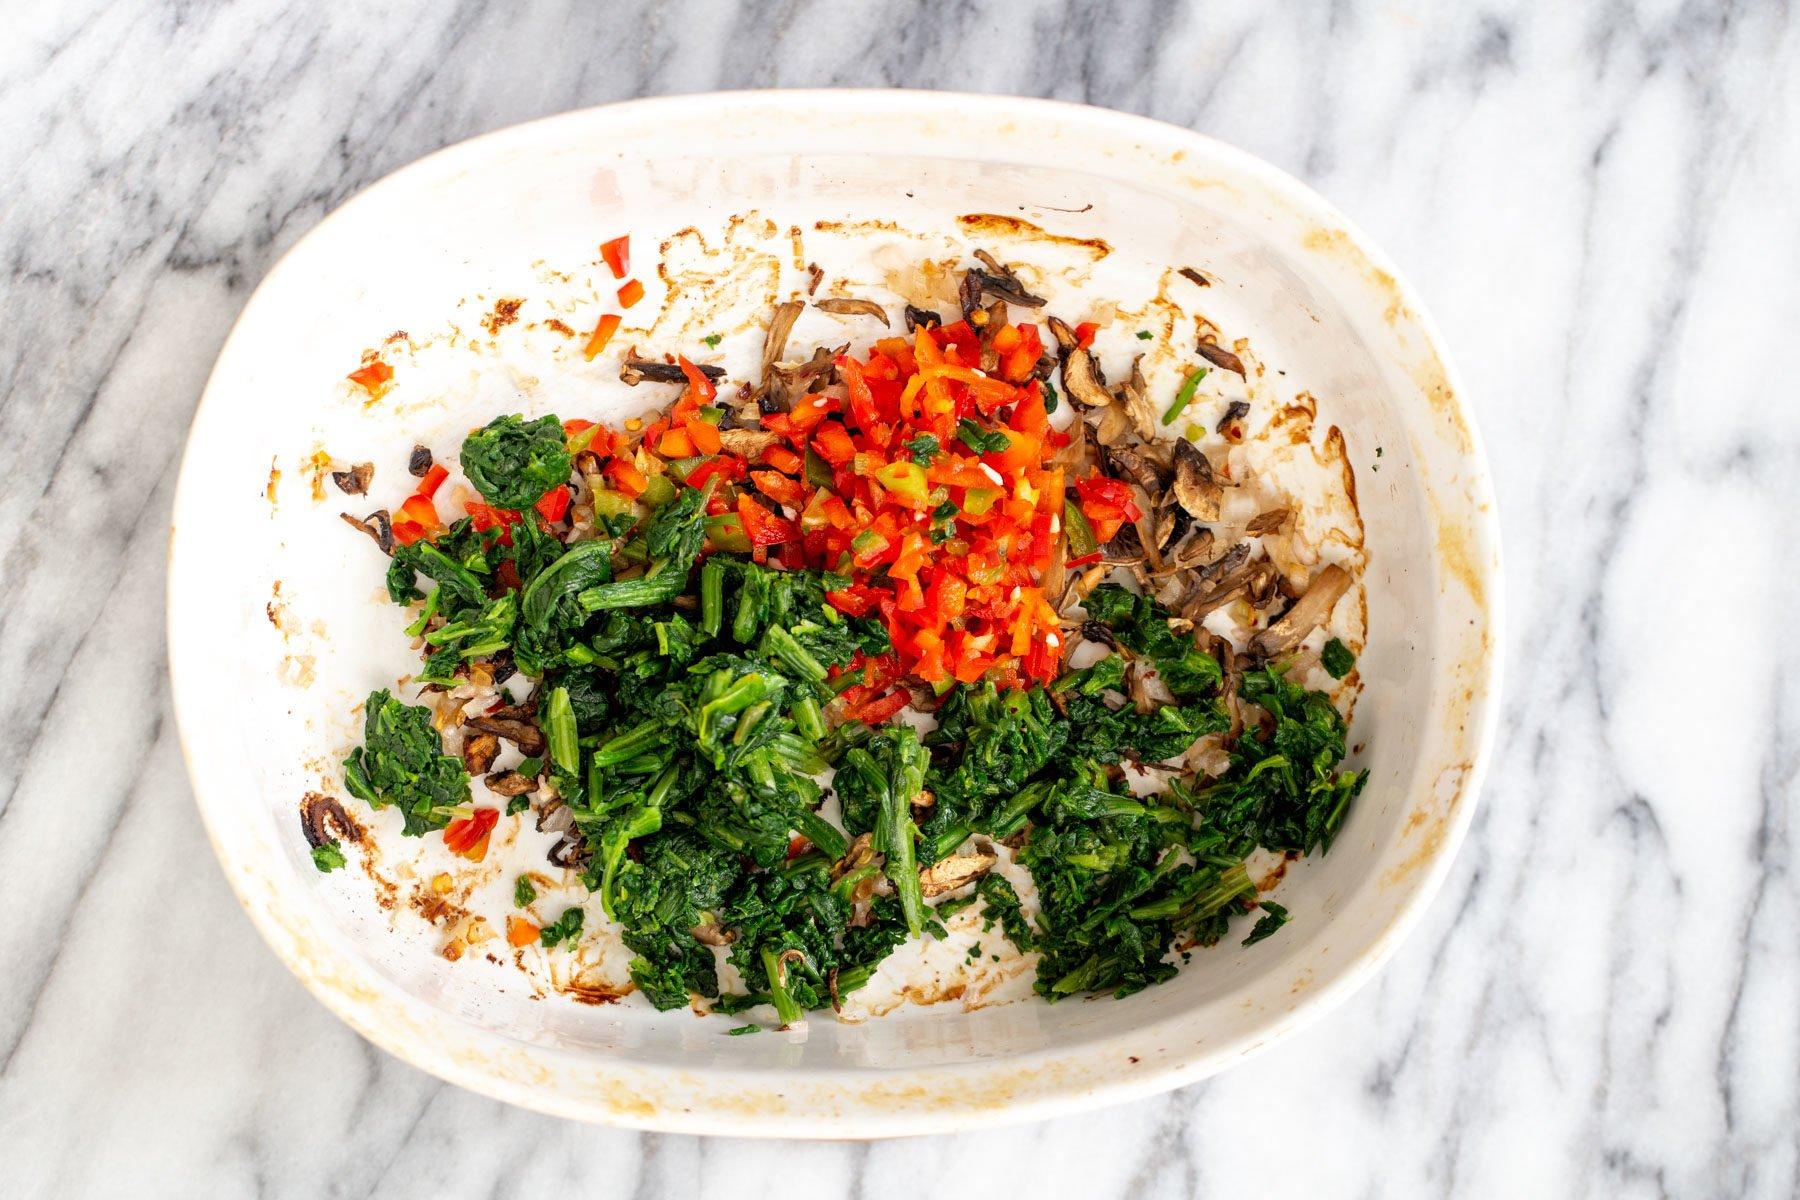 veggies for vegan breakfast casserole in a casserole dish